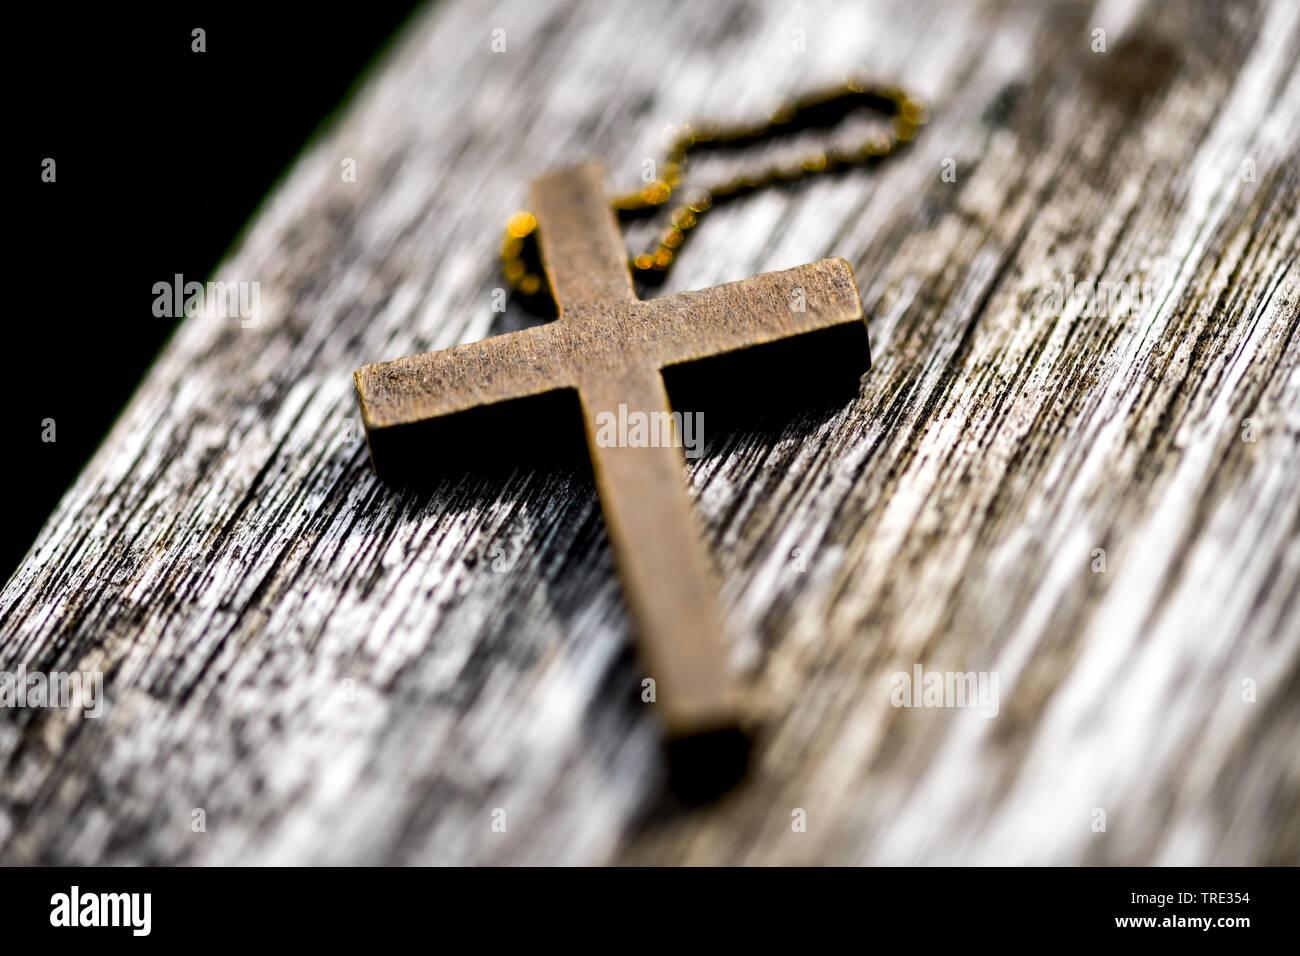 Kreuz liegt auf einer Bank, Deutschland | cross lying on a bench, Germany | BLWS515946.jpg [ (c) blickwinkel/McPHOTO/C. Ohde Tel. +49 (0)2302-2793220, - Stock Image